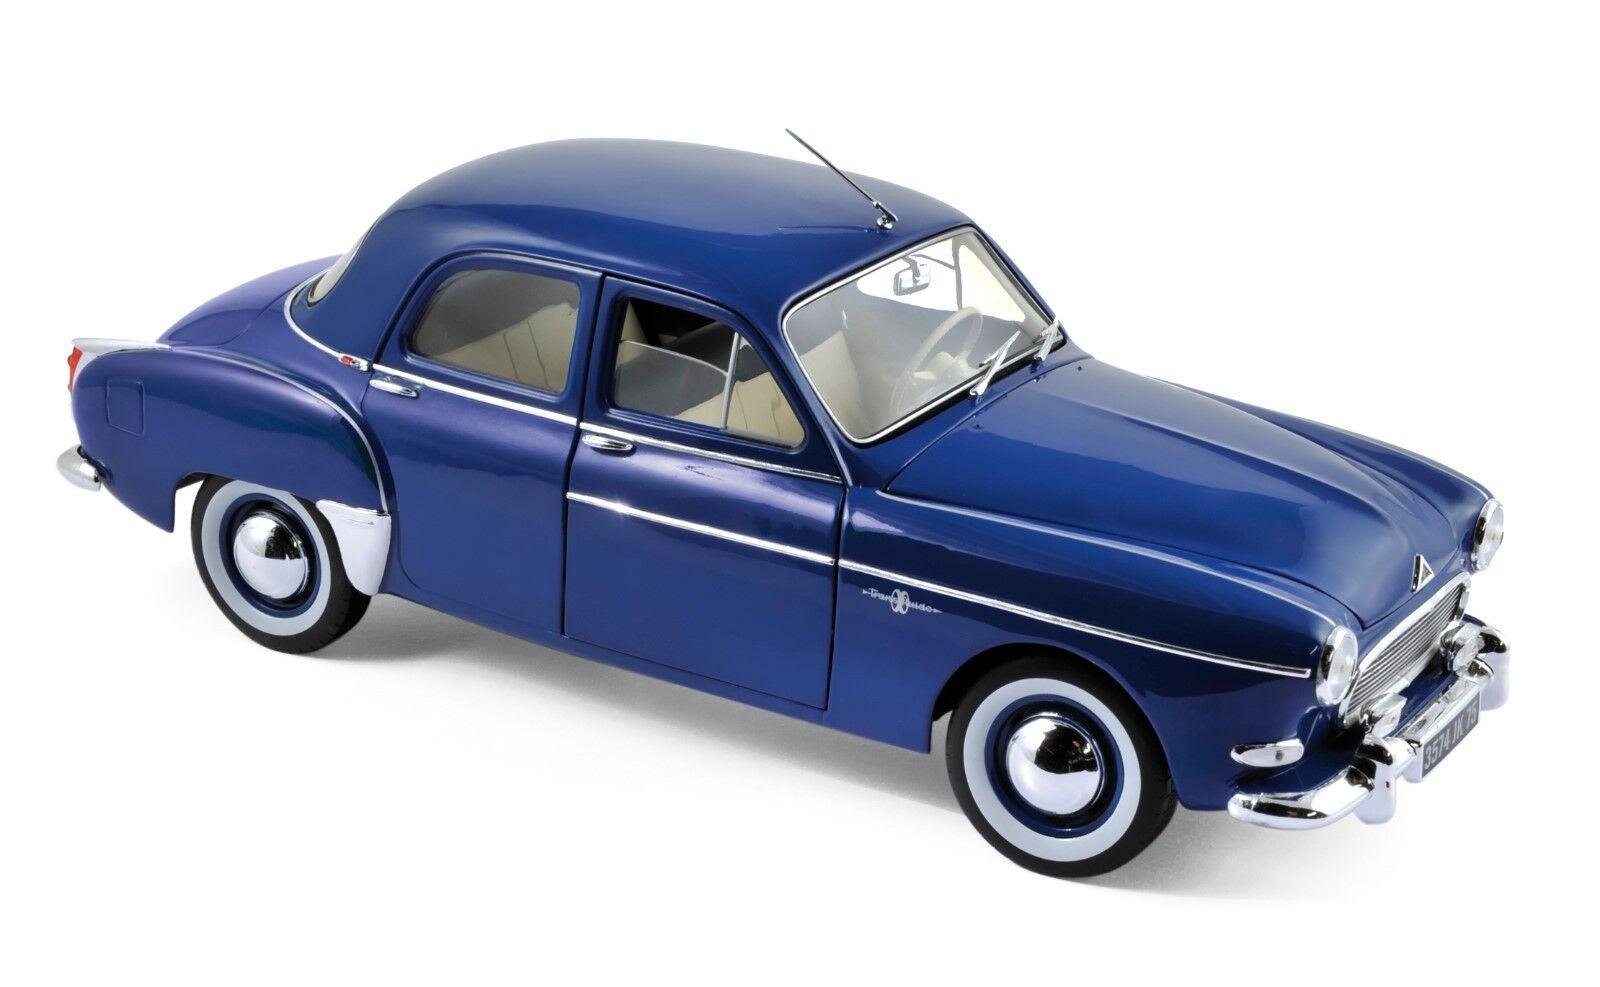 Renault Fregate 1959 blu 1 18 norev nuevo & OVP 185280